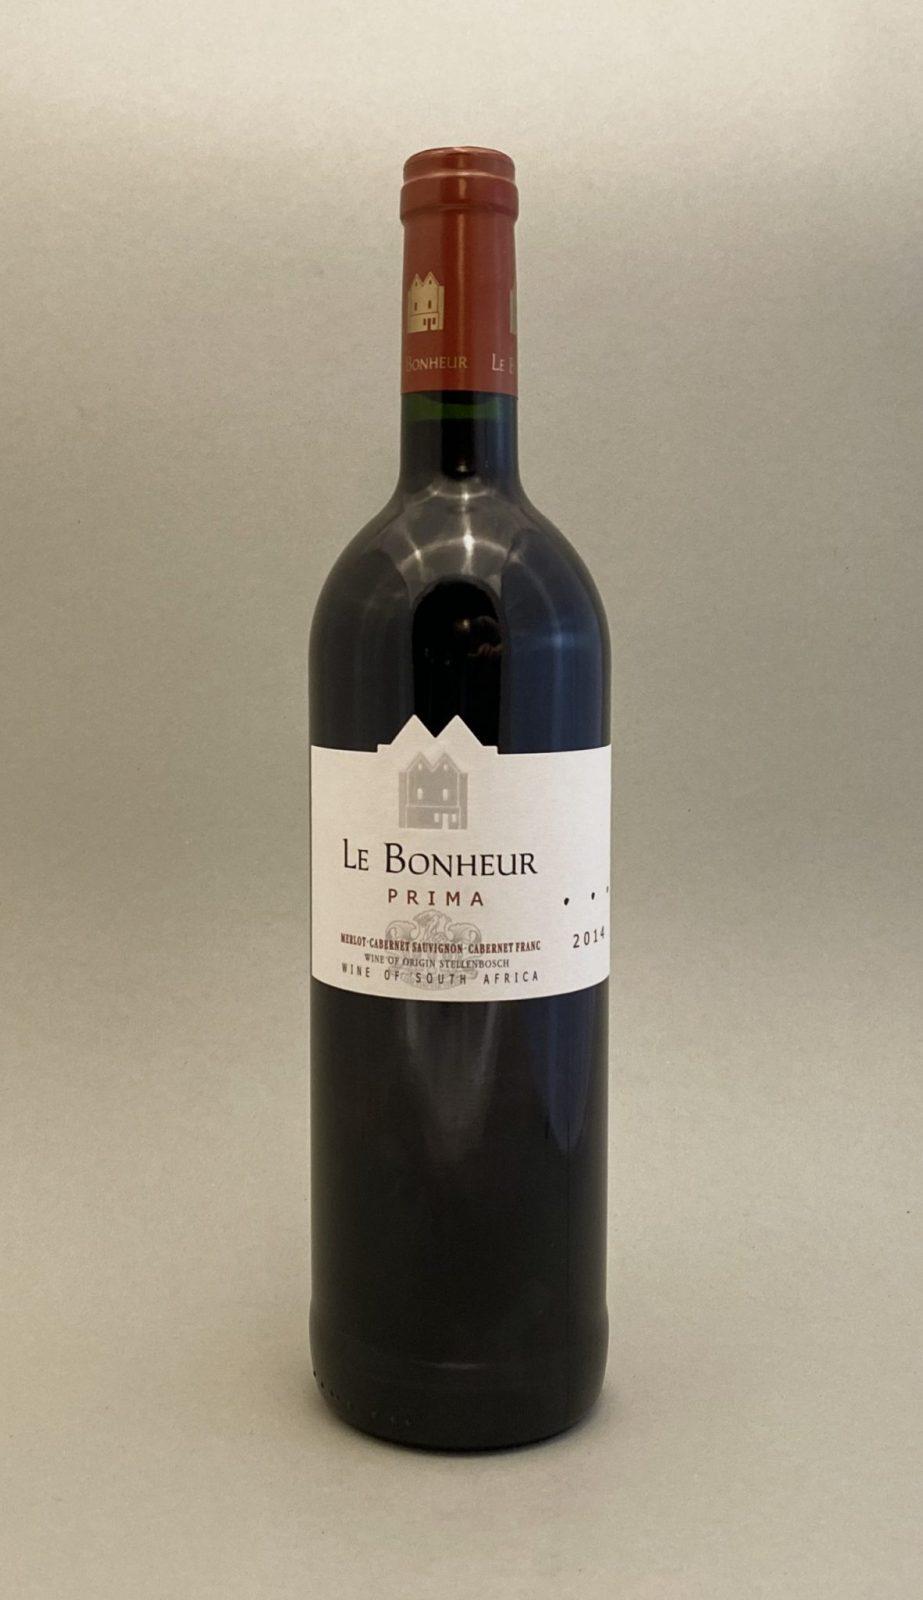 LE BONHEUR Prima 2014, vinoteka Sunny wines slnecnice mesto, Bratislava petrzalka, vino červené z Južnej Afriky